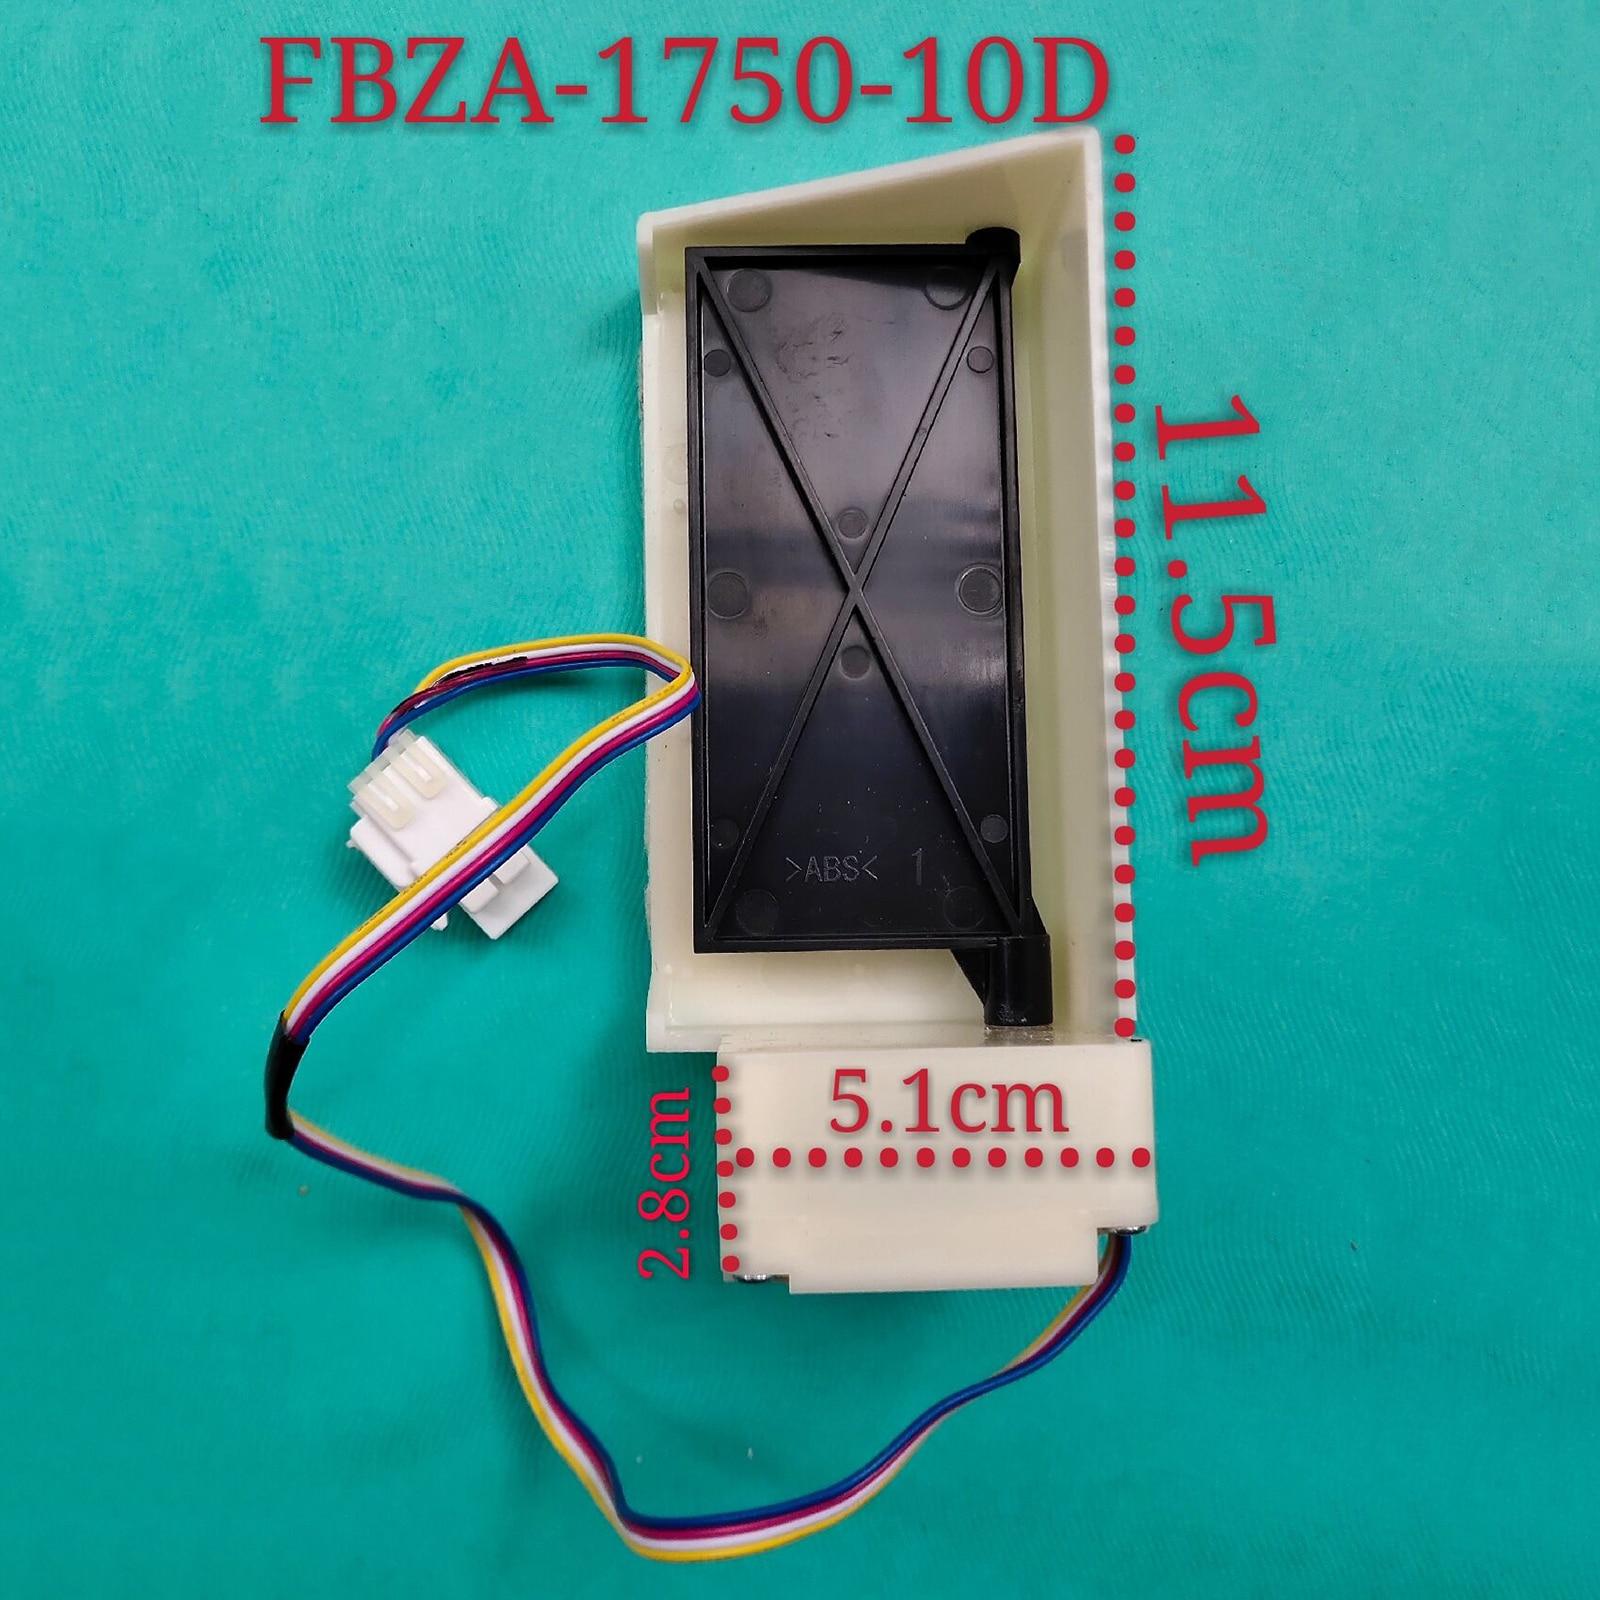 1PC Demper Motor FBZA-1750-10D Vervanging voor Samsung DA31-00043F BCD-286WNQISS1 290WNRISA1 WNSIWW Koelkast Accessoires